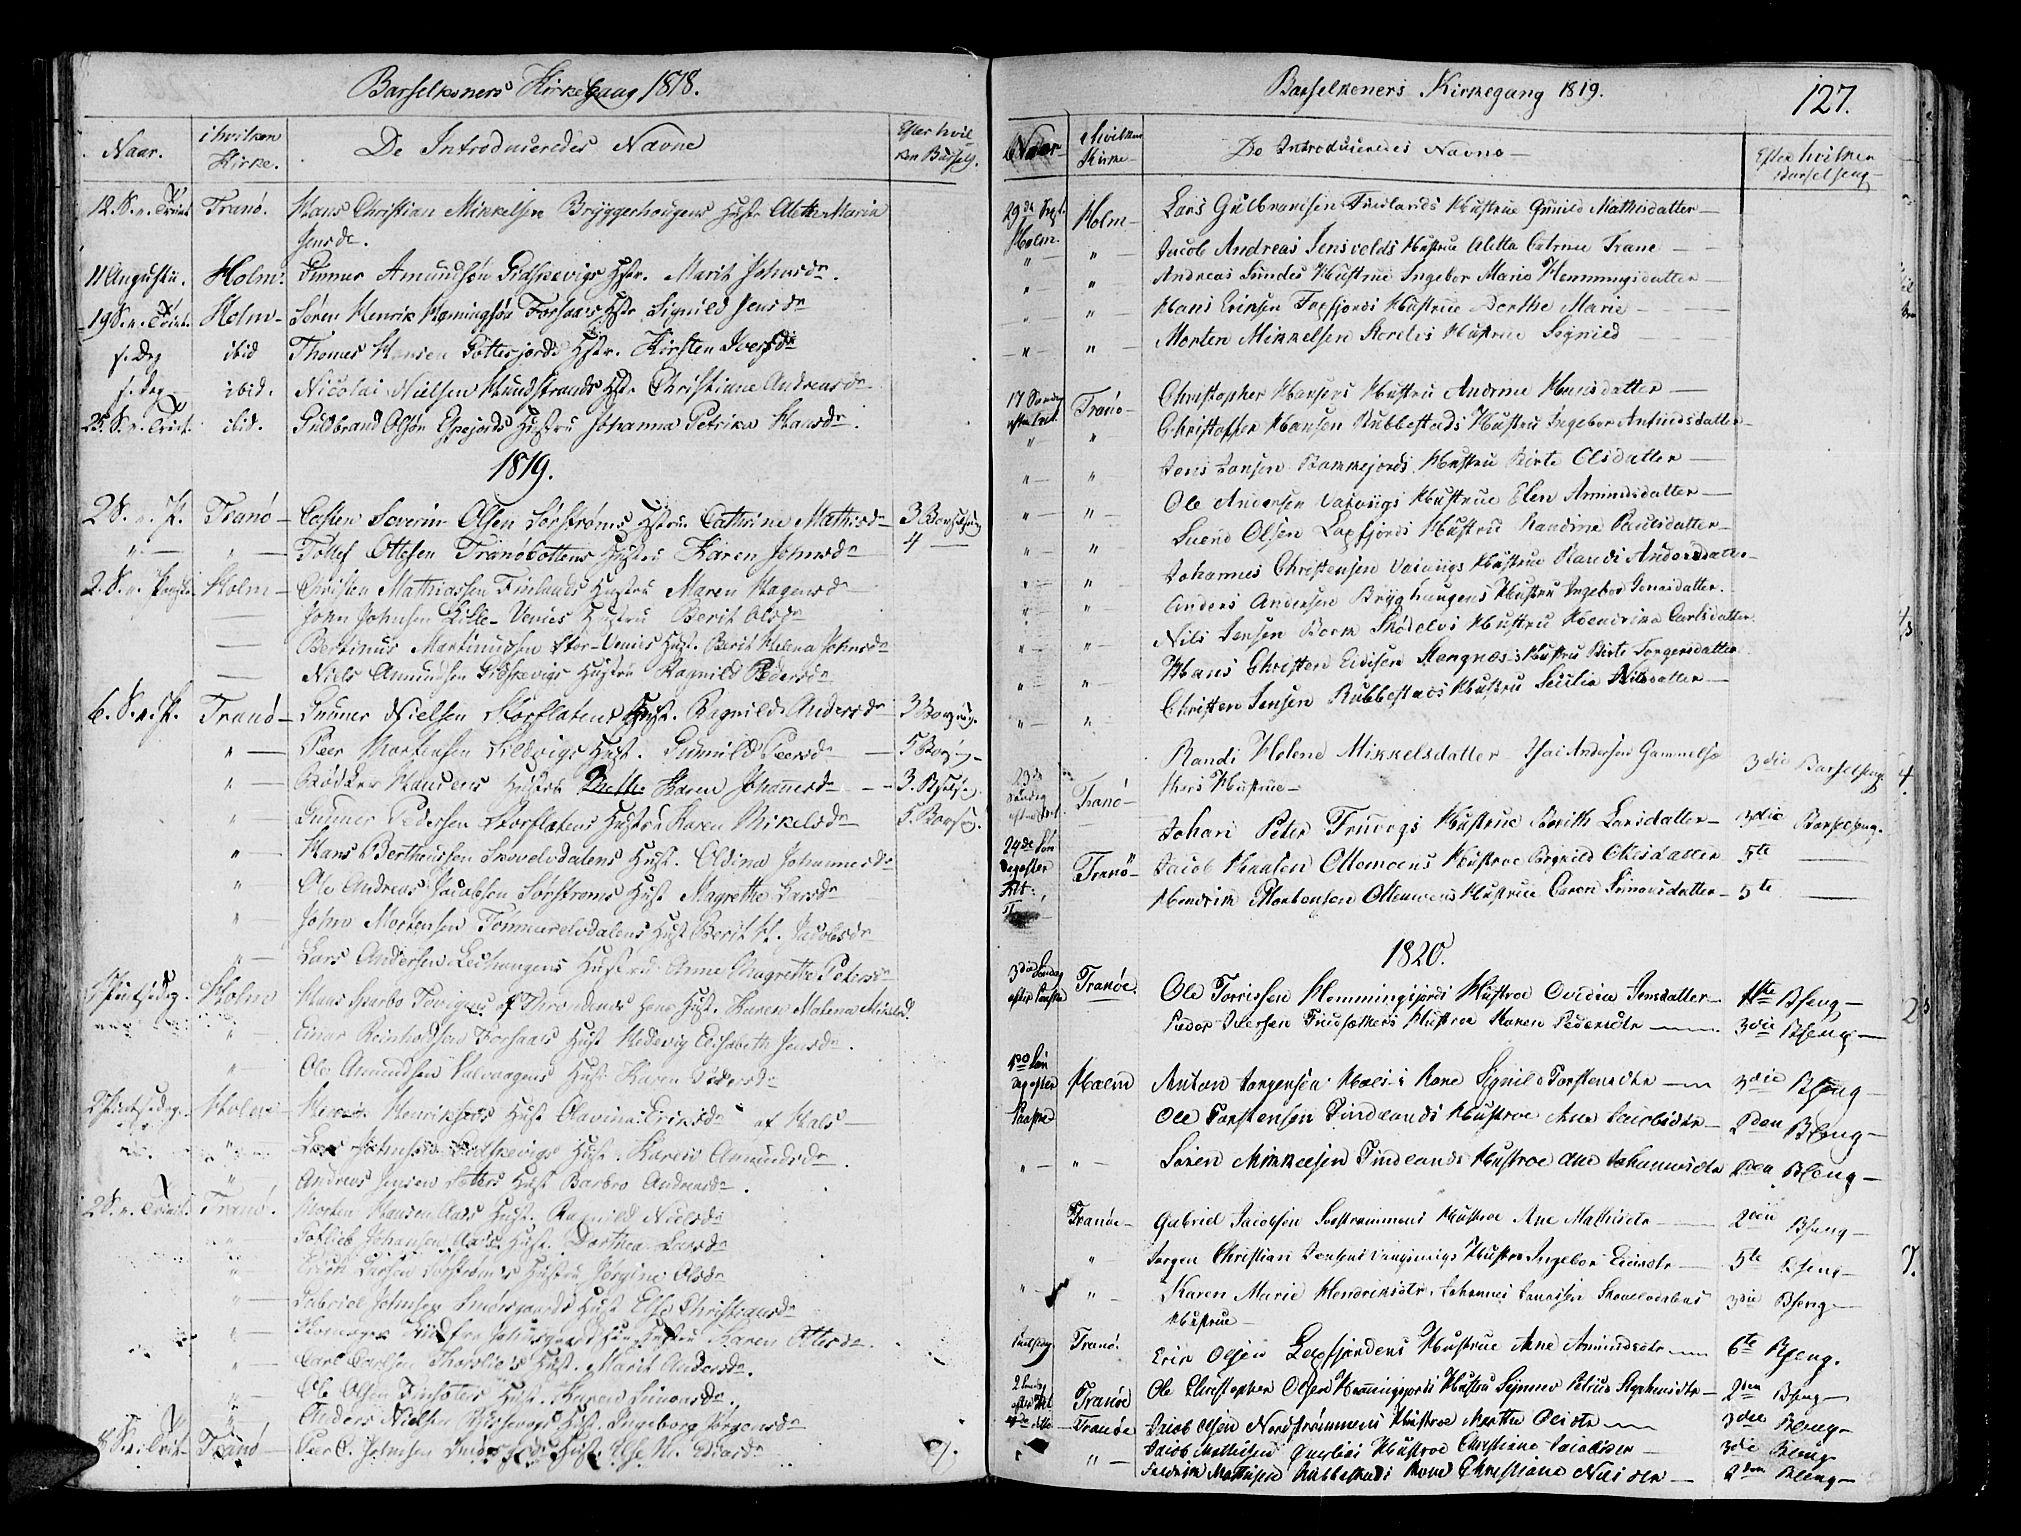 SATØ, Tranøy sokneprestkontor, I/Ia/Iaa/L0003kirke: Ministerialbok nr. 3, 1807-1820, s. 127